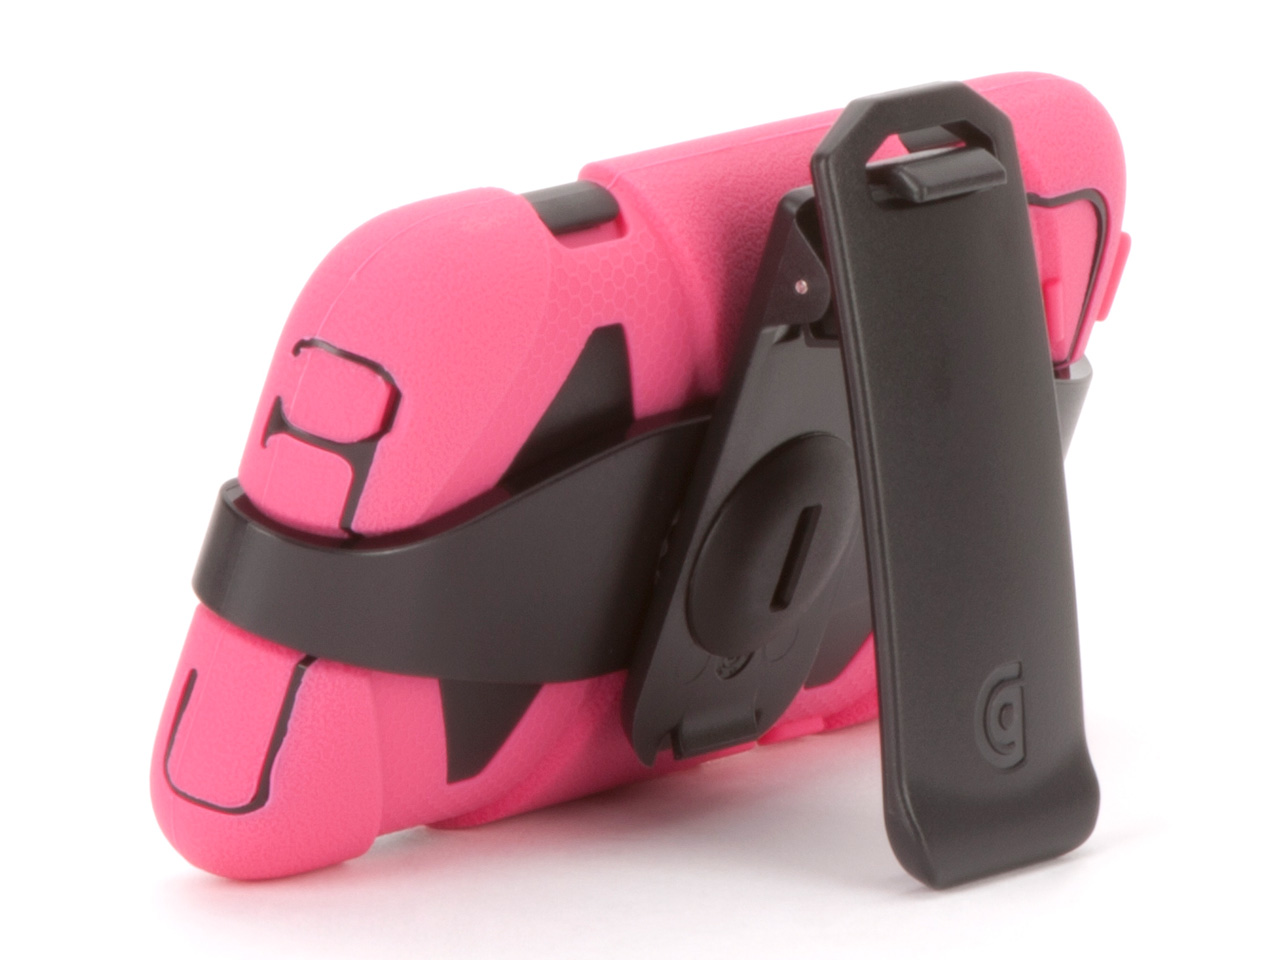 Pink/Black Survivor All-Terrain Case for iPod touch 4th Gen.